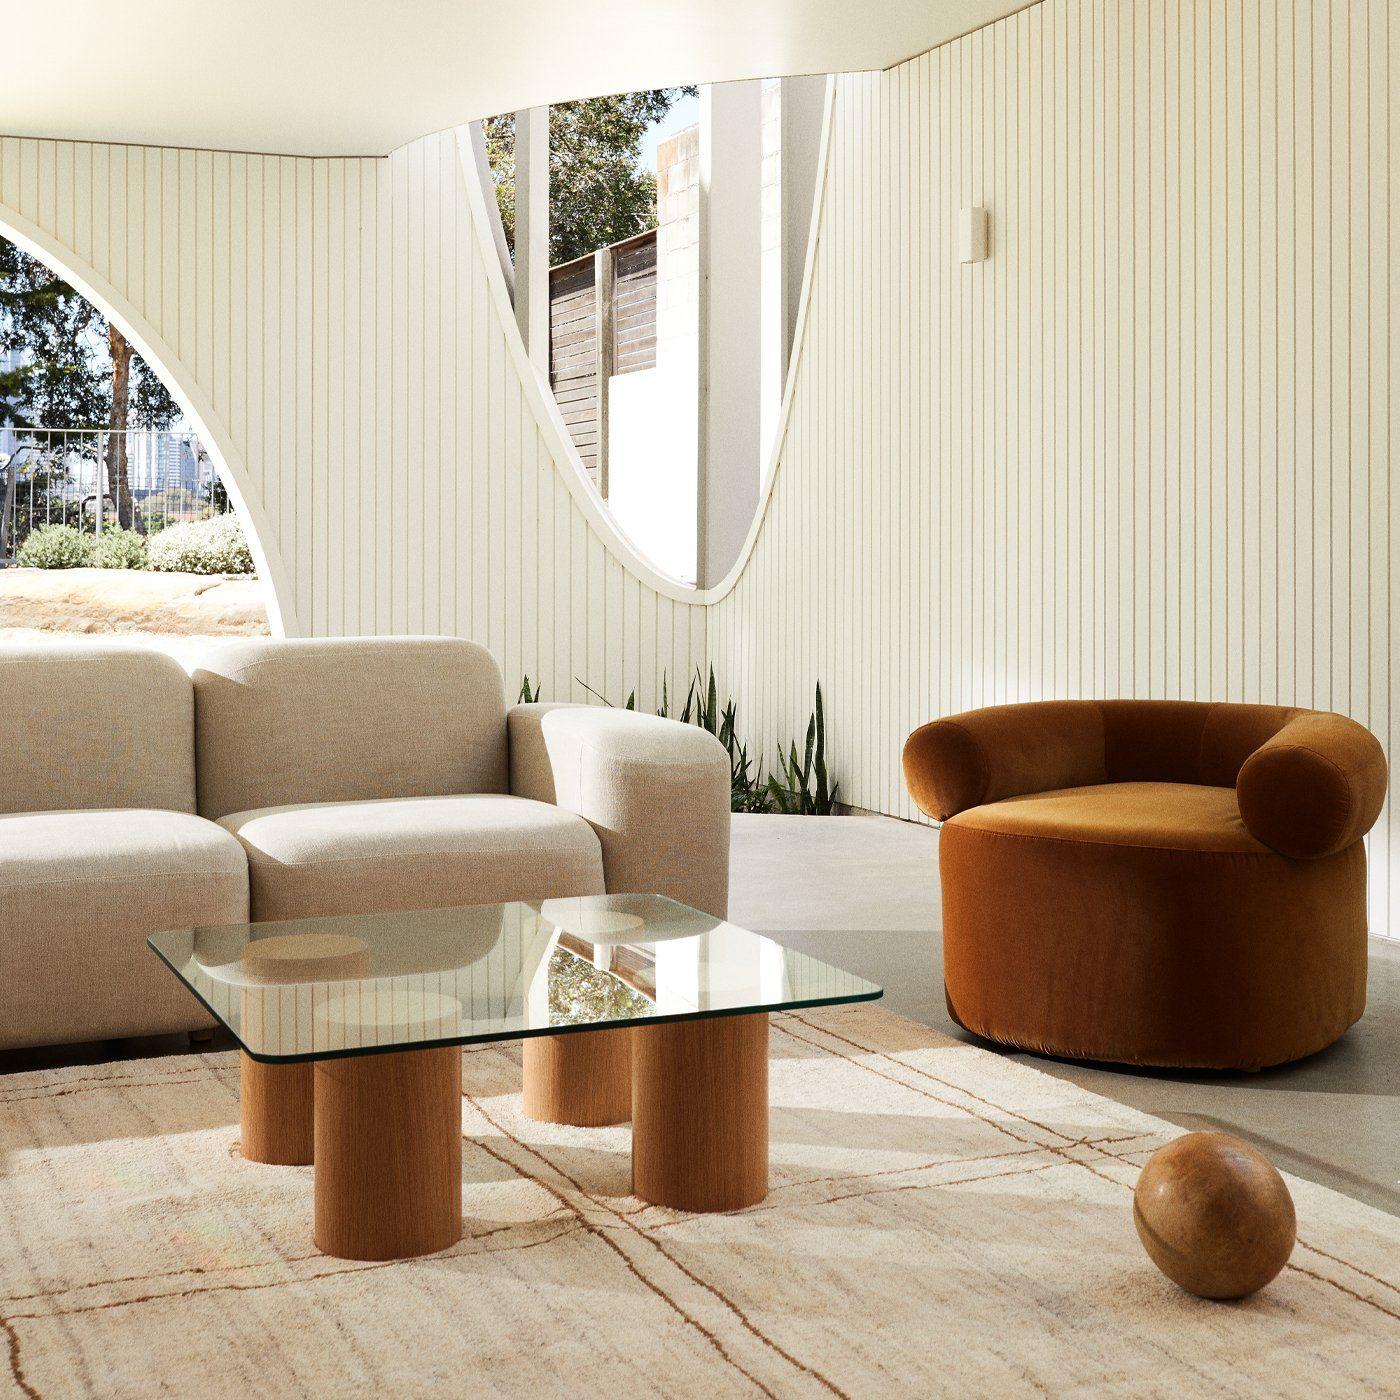 Tide Coffee Table Oak In 2021 Furniture Design Materials Board Interior Design Interior Design Furniture [ 1400 x 1400 Pixel ]